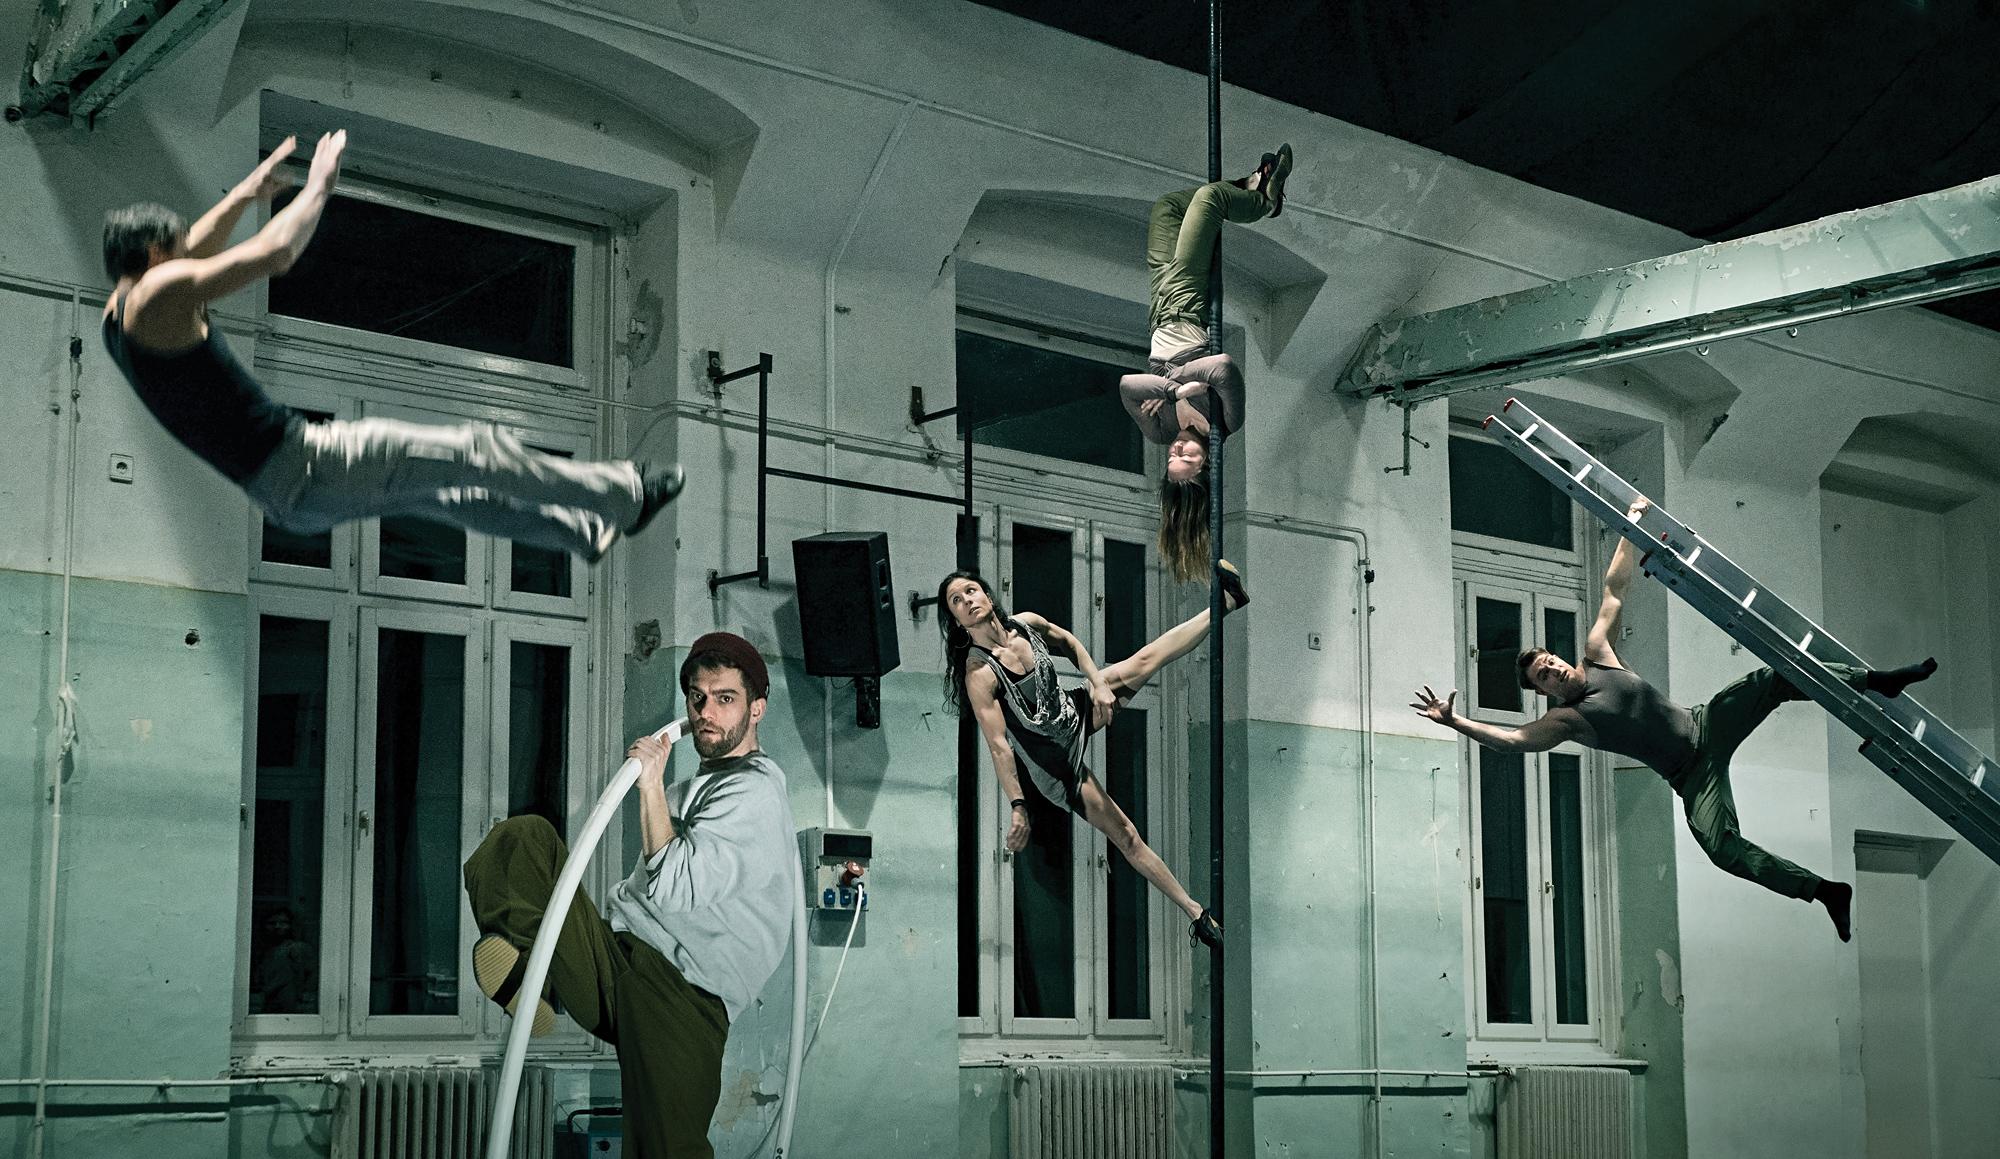 grotesqu_gymnastics_kudarc_te_ri_ga_spa_r.jpg